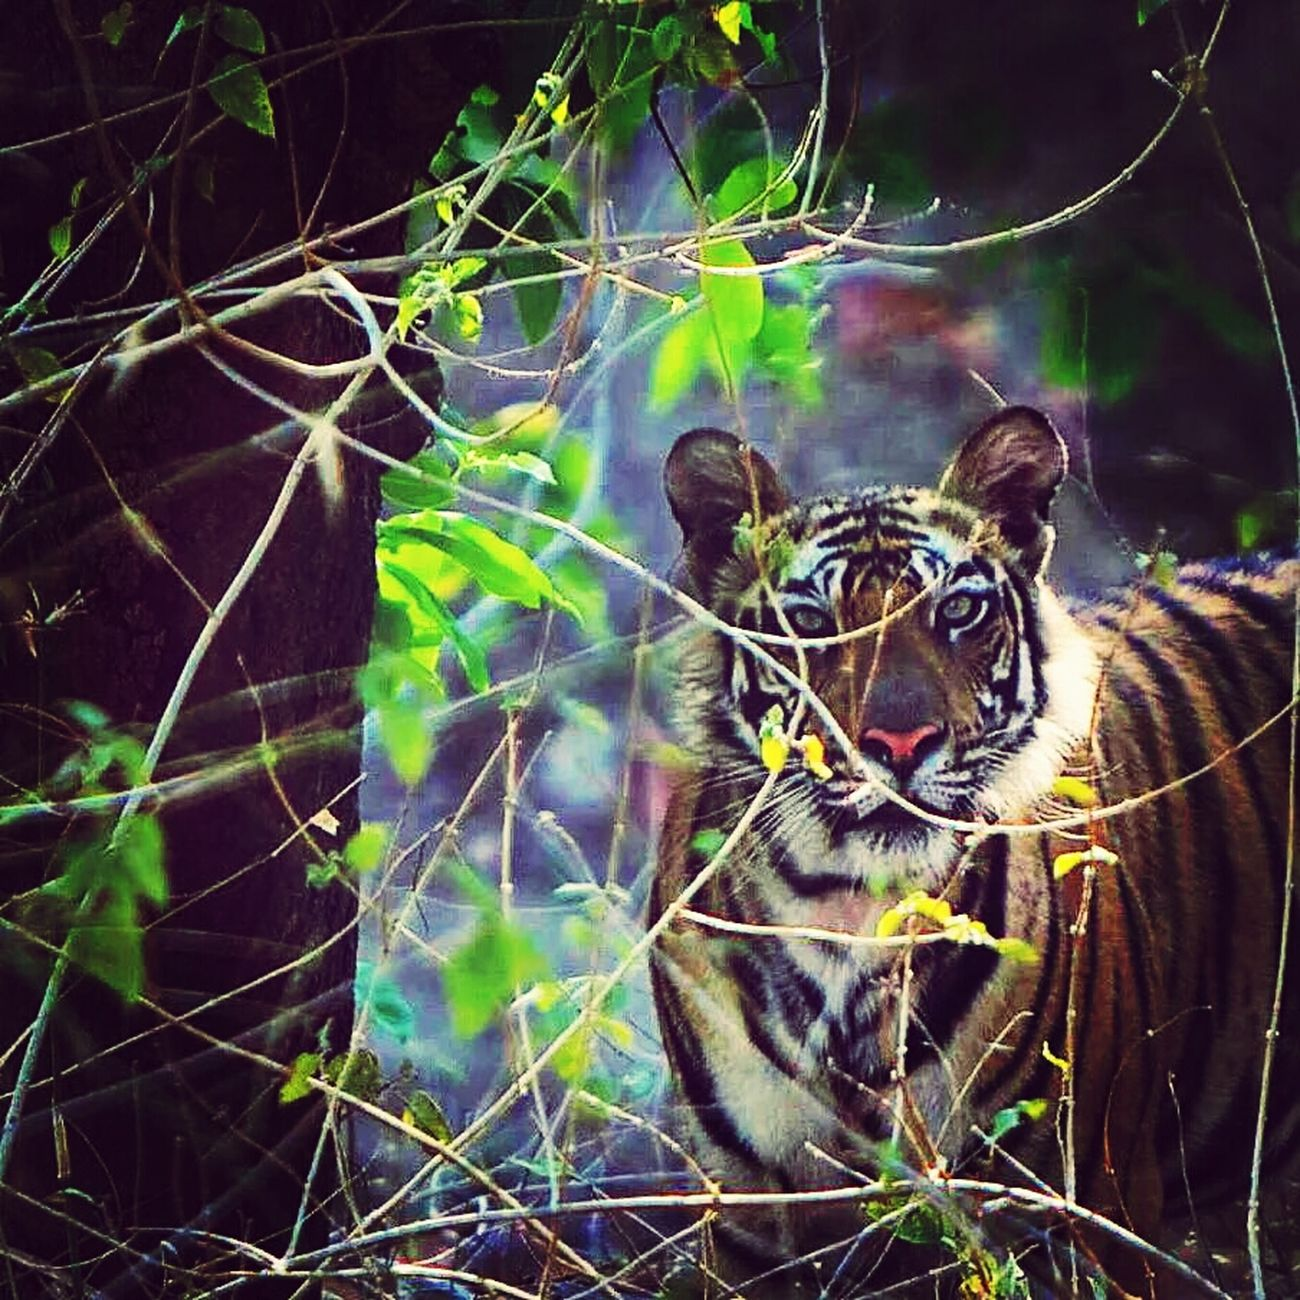 Tiger Bandavgragh Wildlife & Nature Bigcat